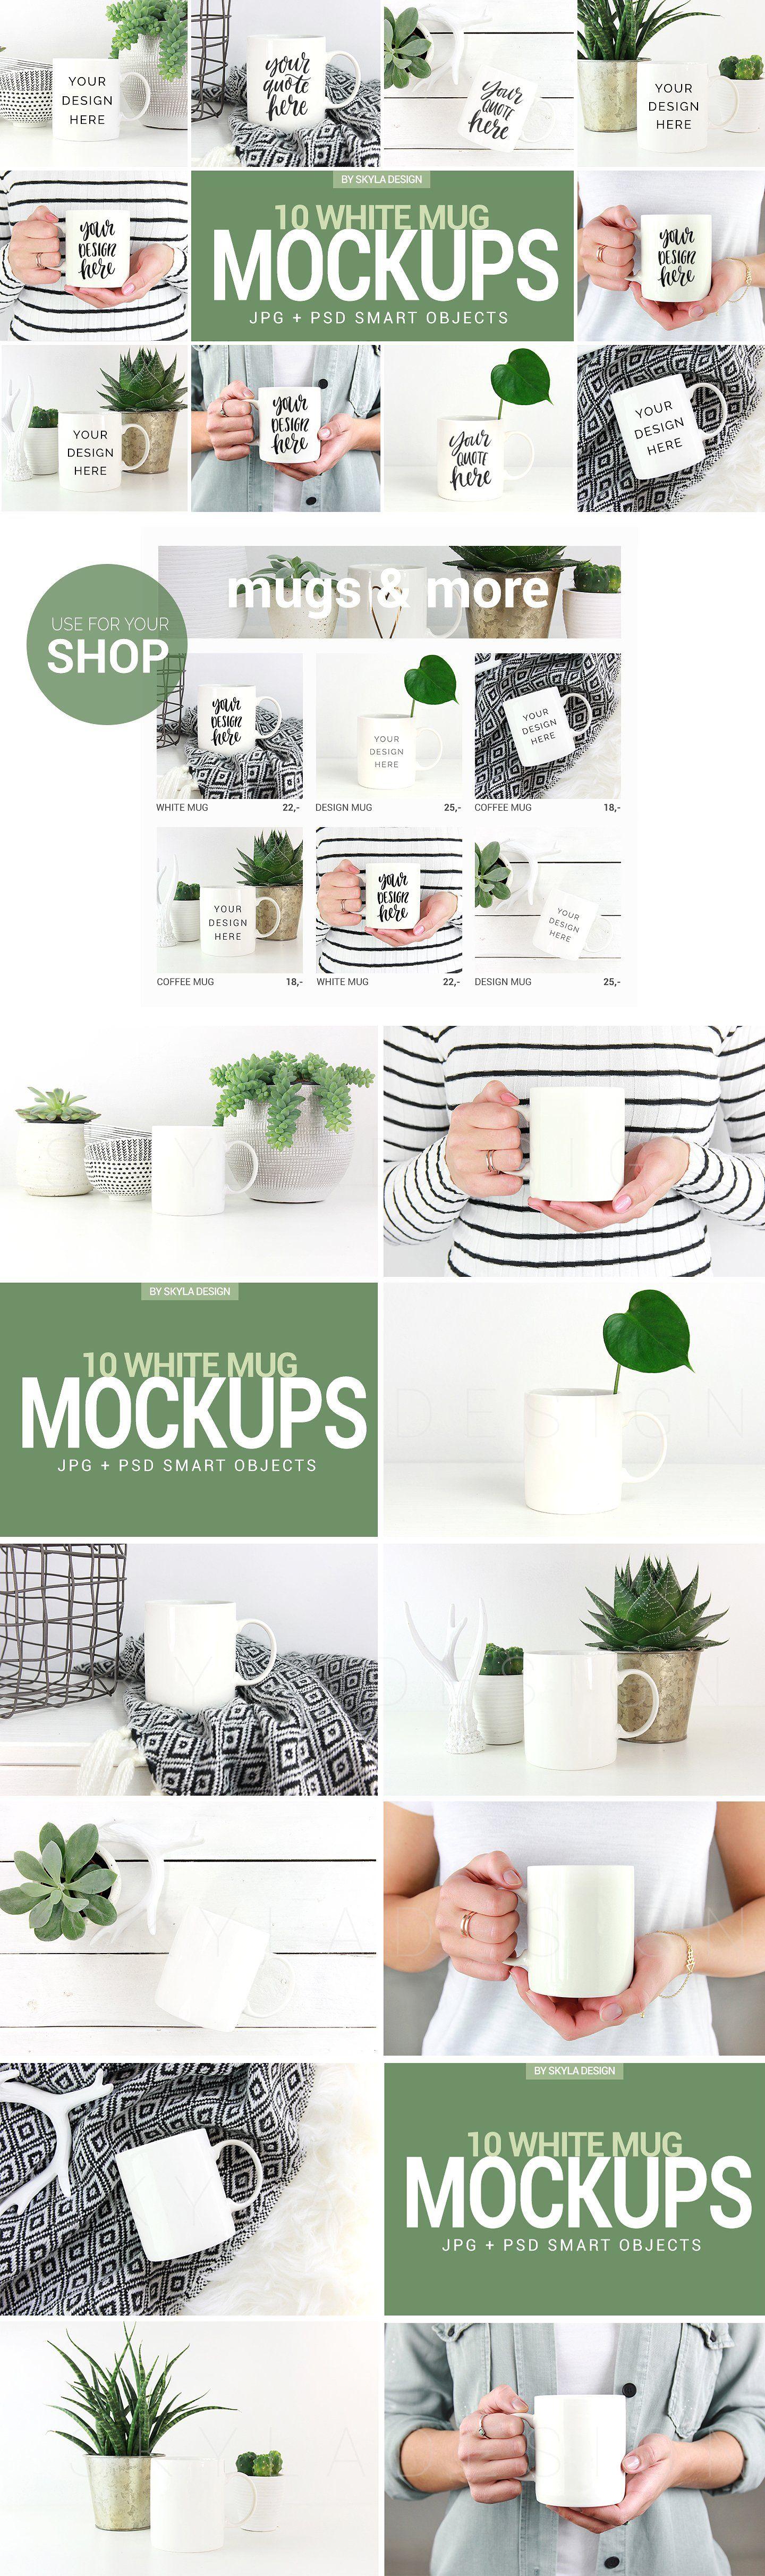 White coffee mug mockup photos by Skyla Design on